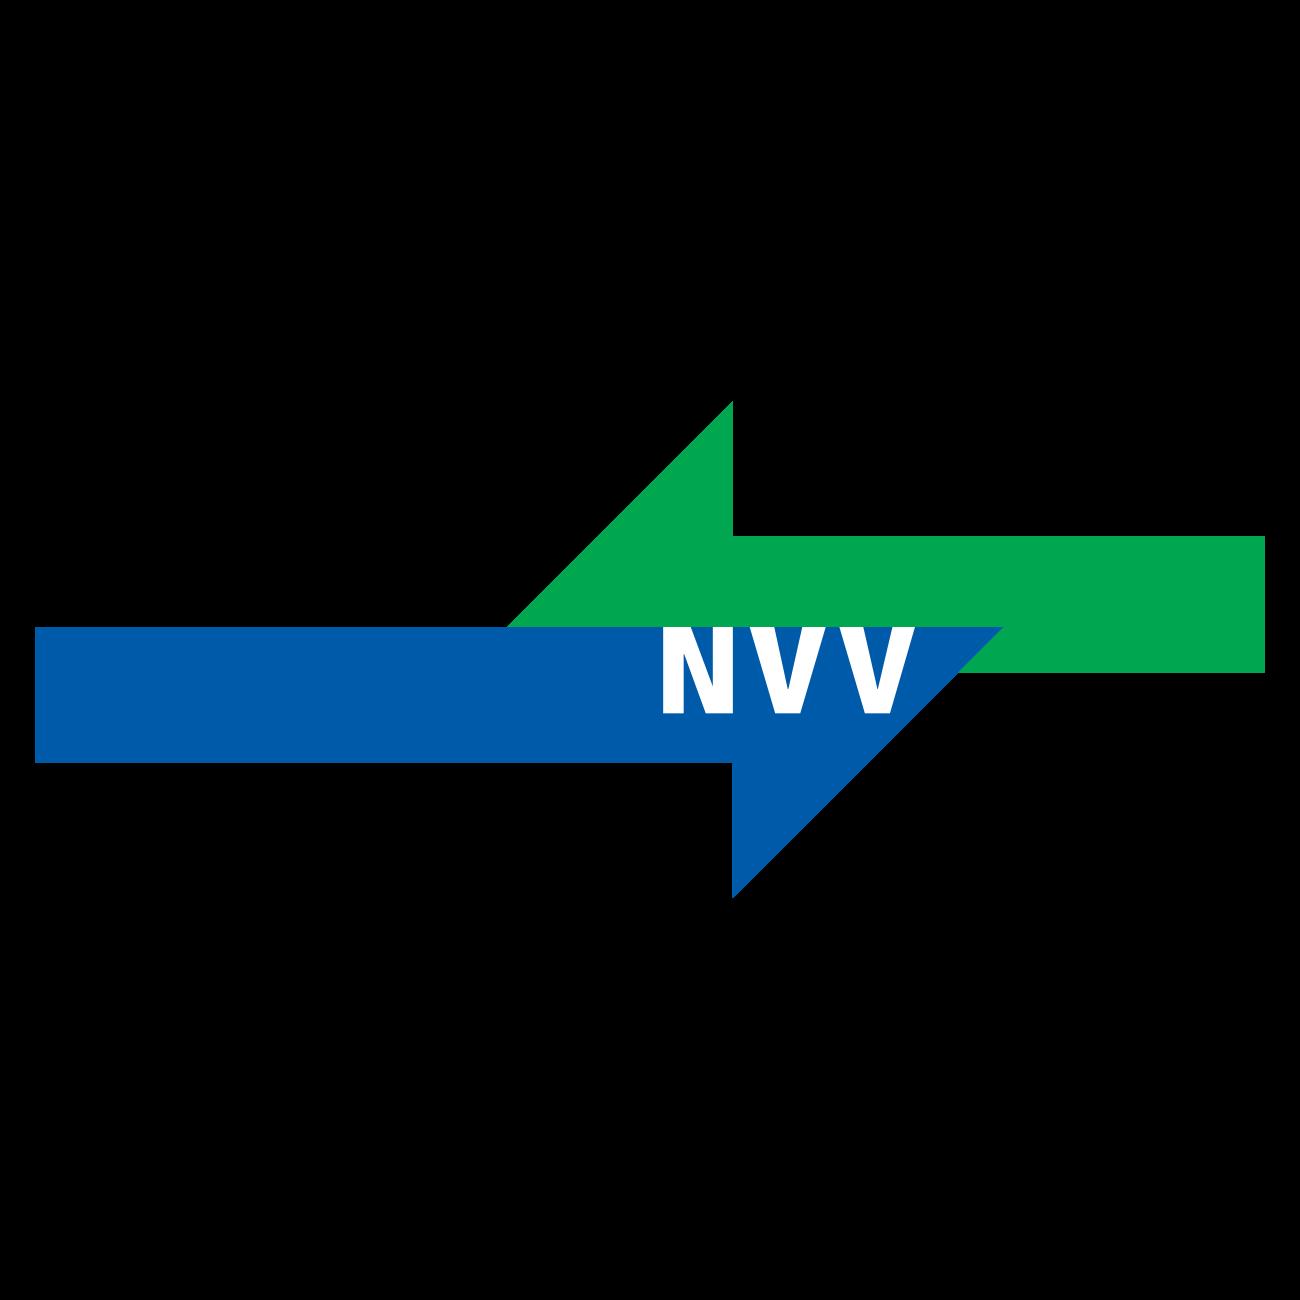 NVV.png